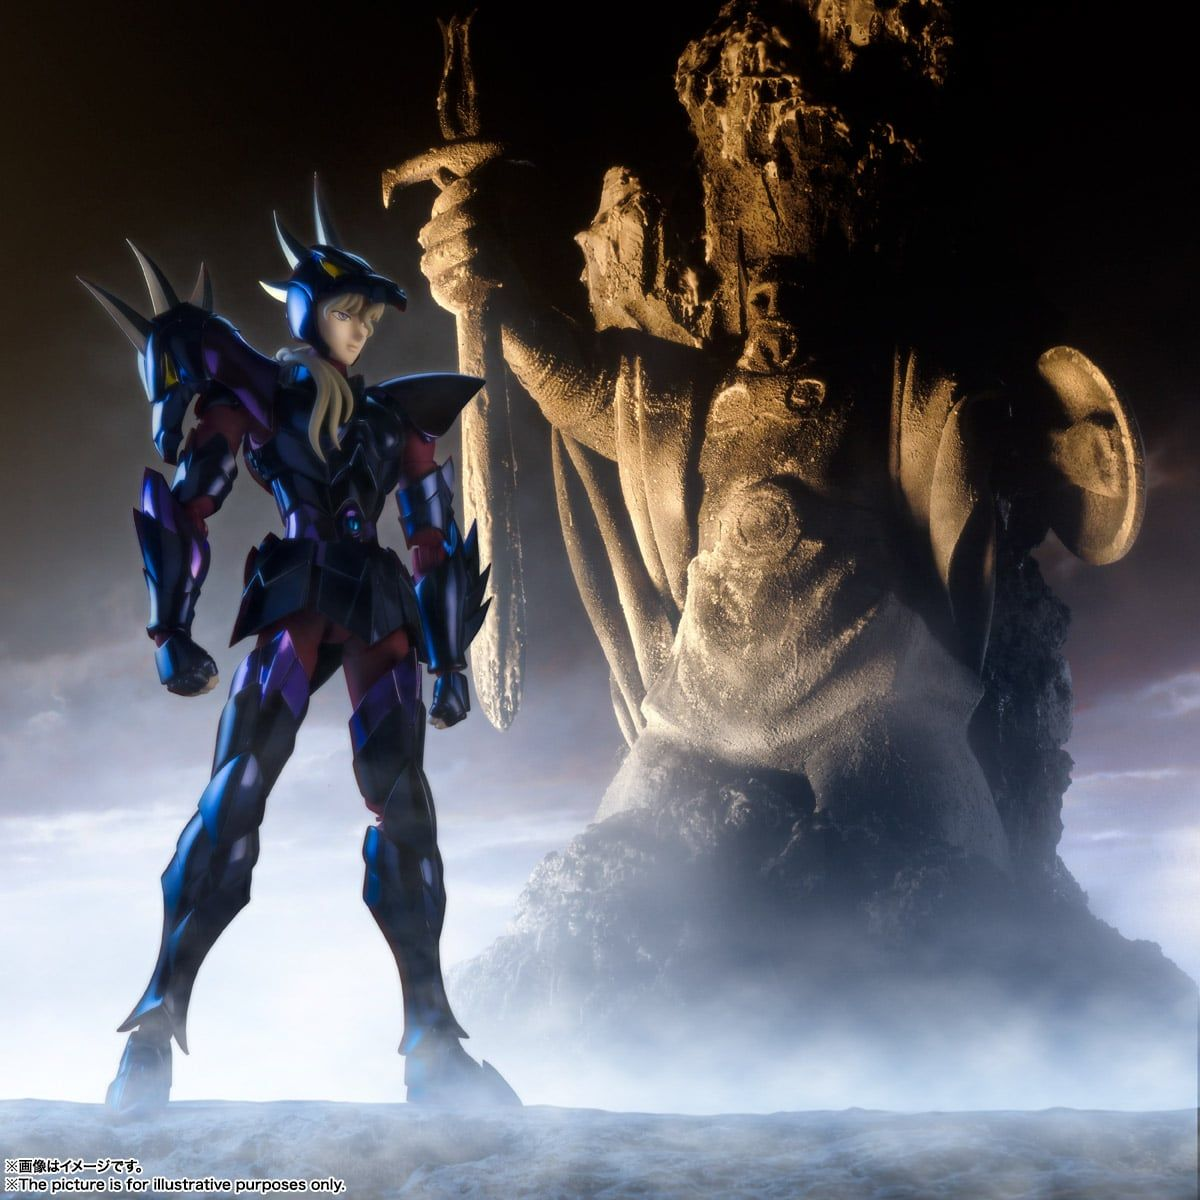 BANDAI Saint Seiya Cloth Myth EX Dubhe Alpha Siegfried Action Figure,In stock